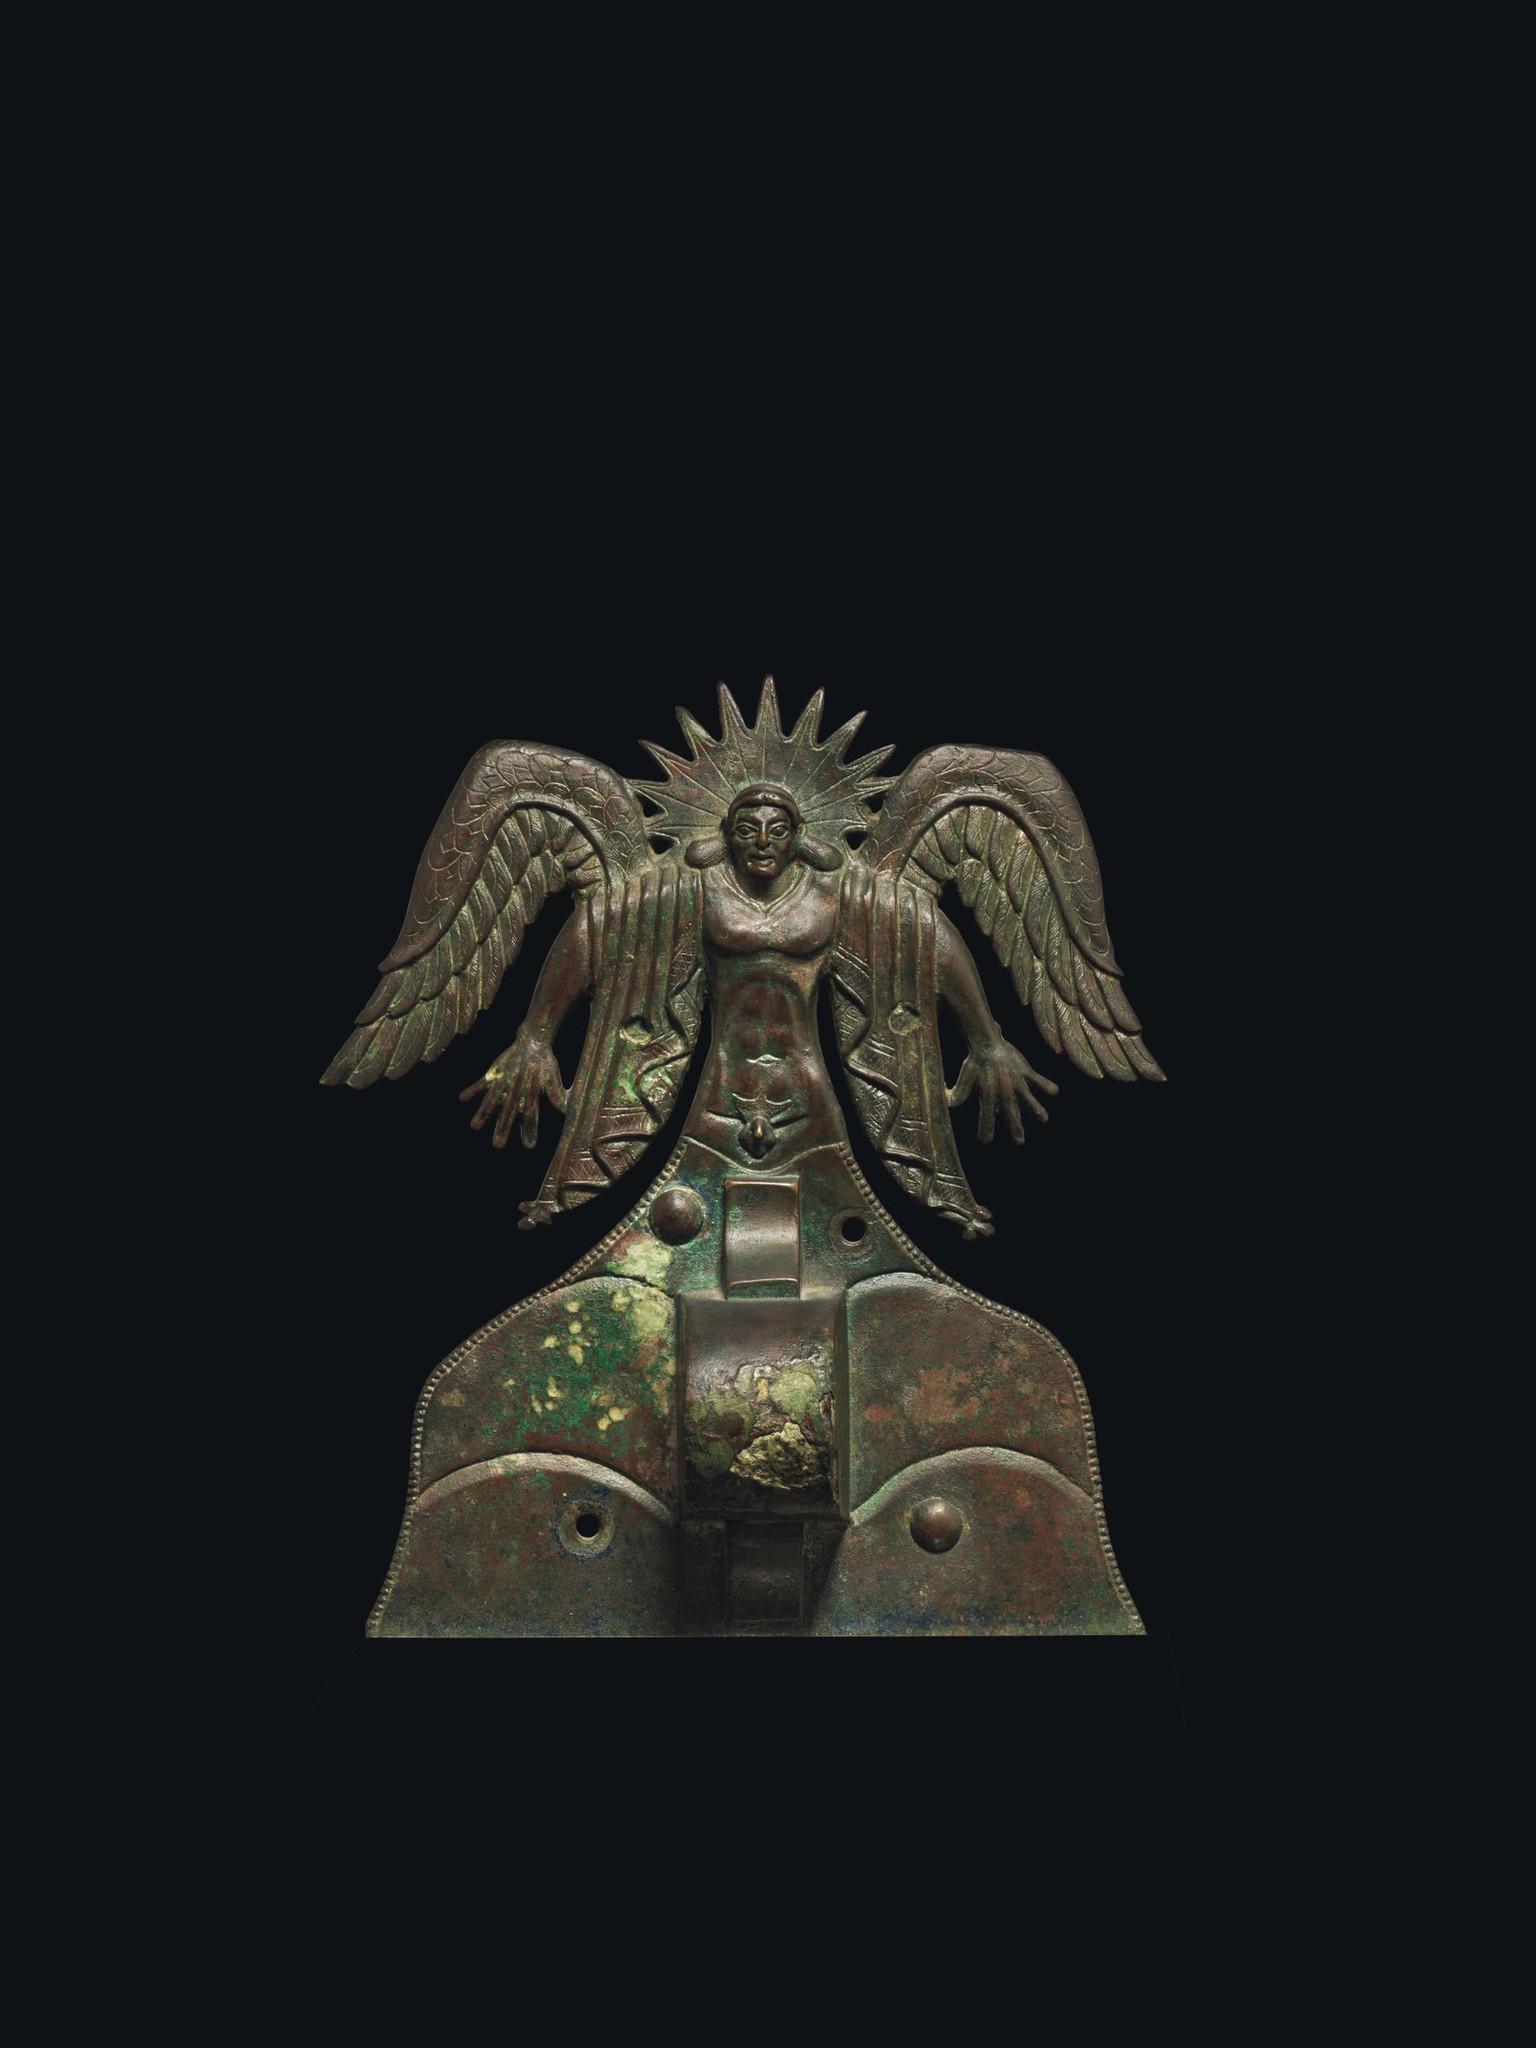 Etruscan bronze applique depicting the Sun God Usil, Etruscan, 500-475 BC.